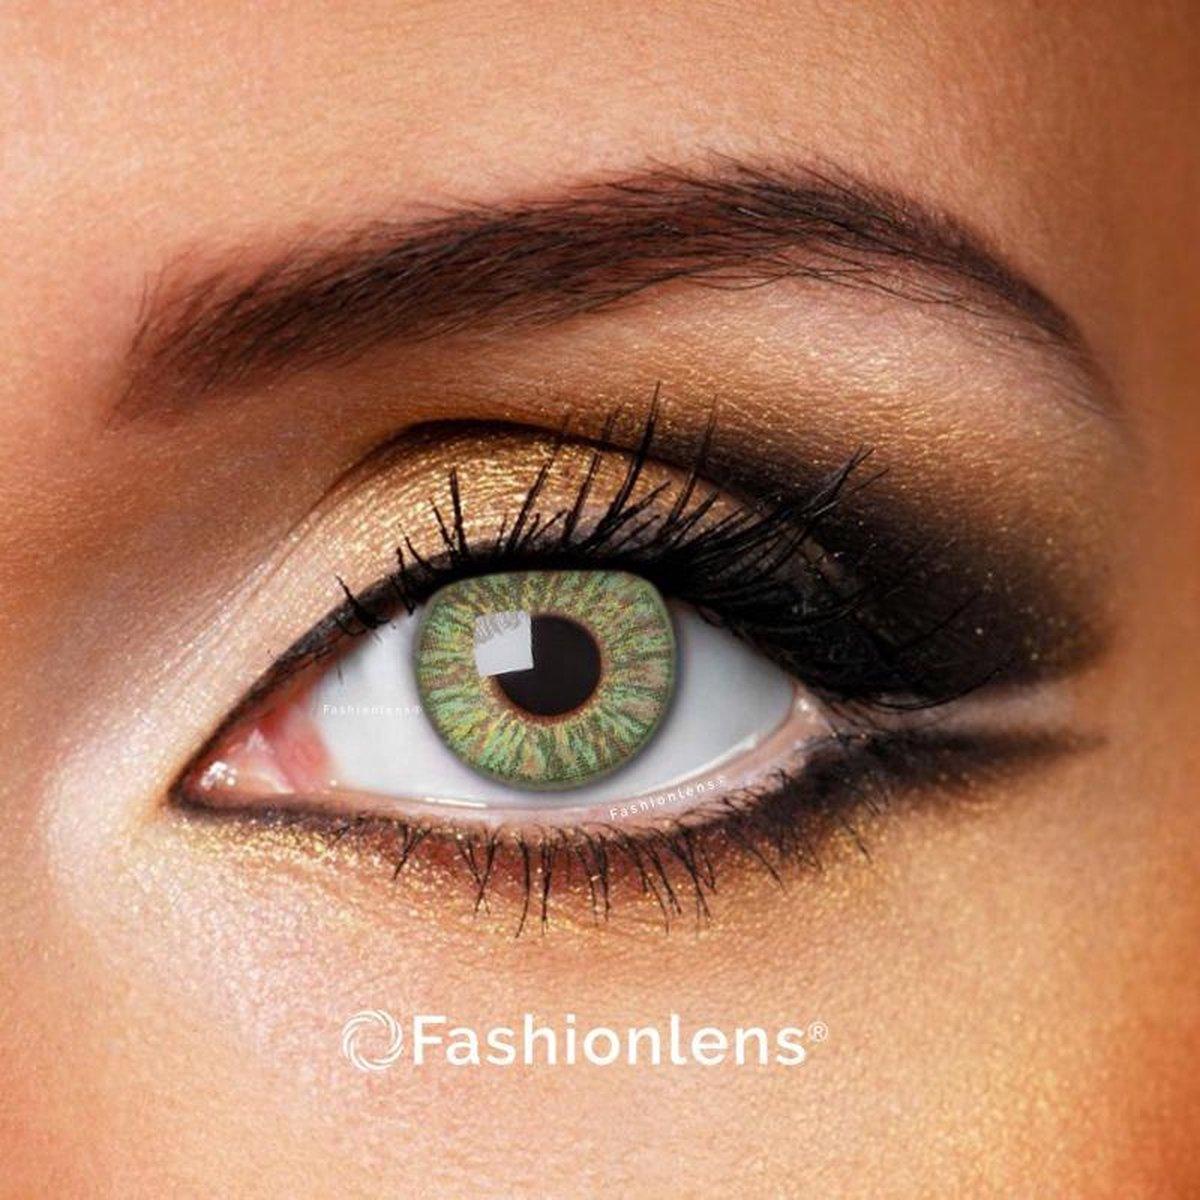 Kleurlenzen - Green Passion - jaarlenzen met lenshouder - groene contactlenzen Fashionlens